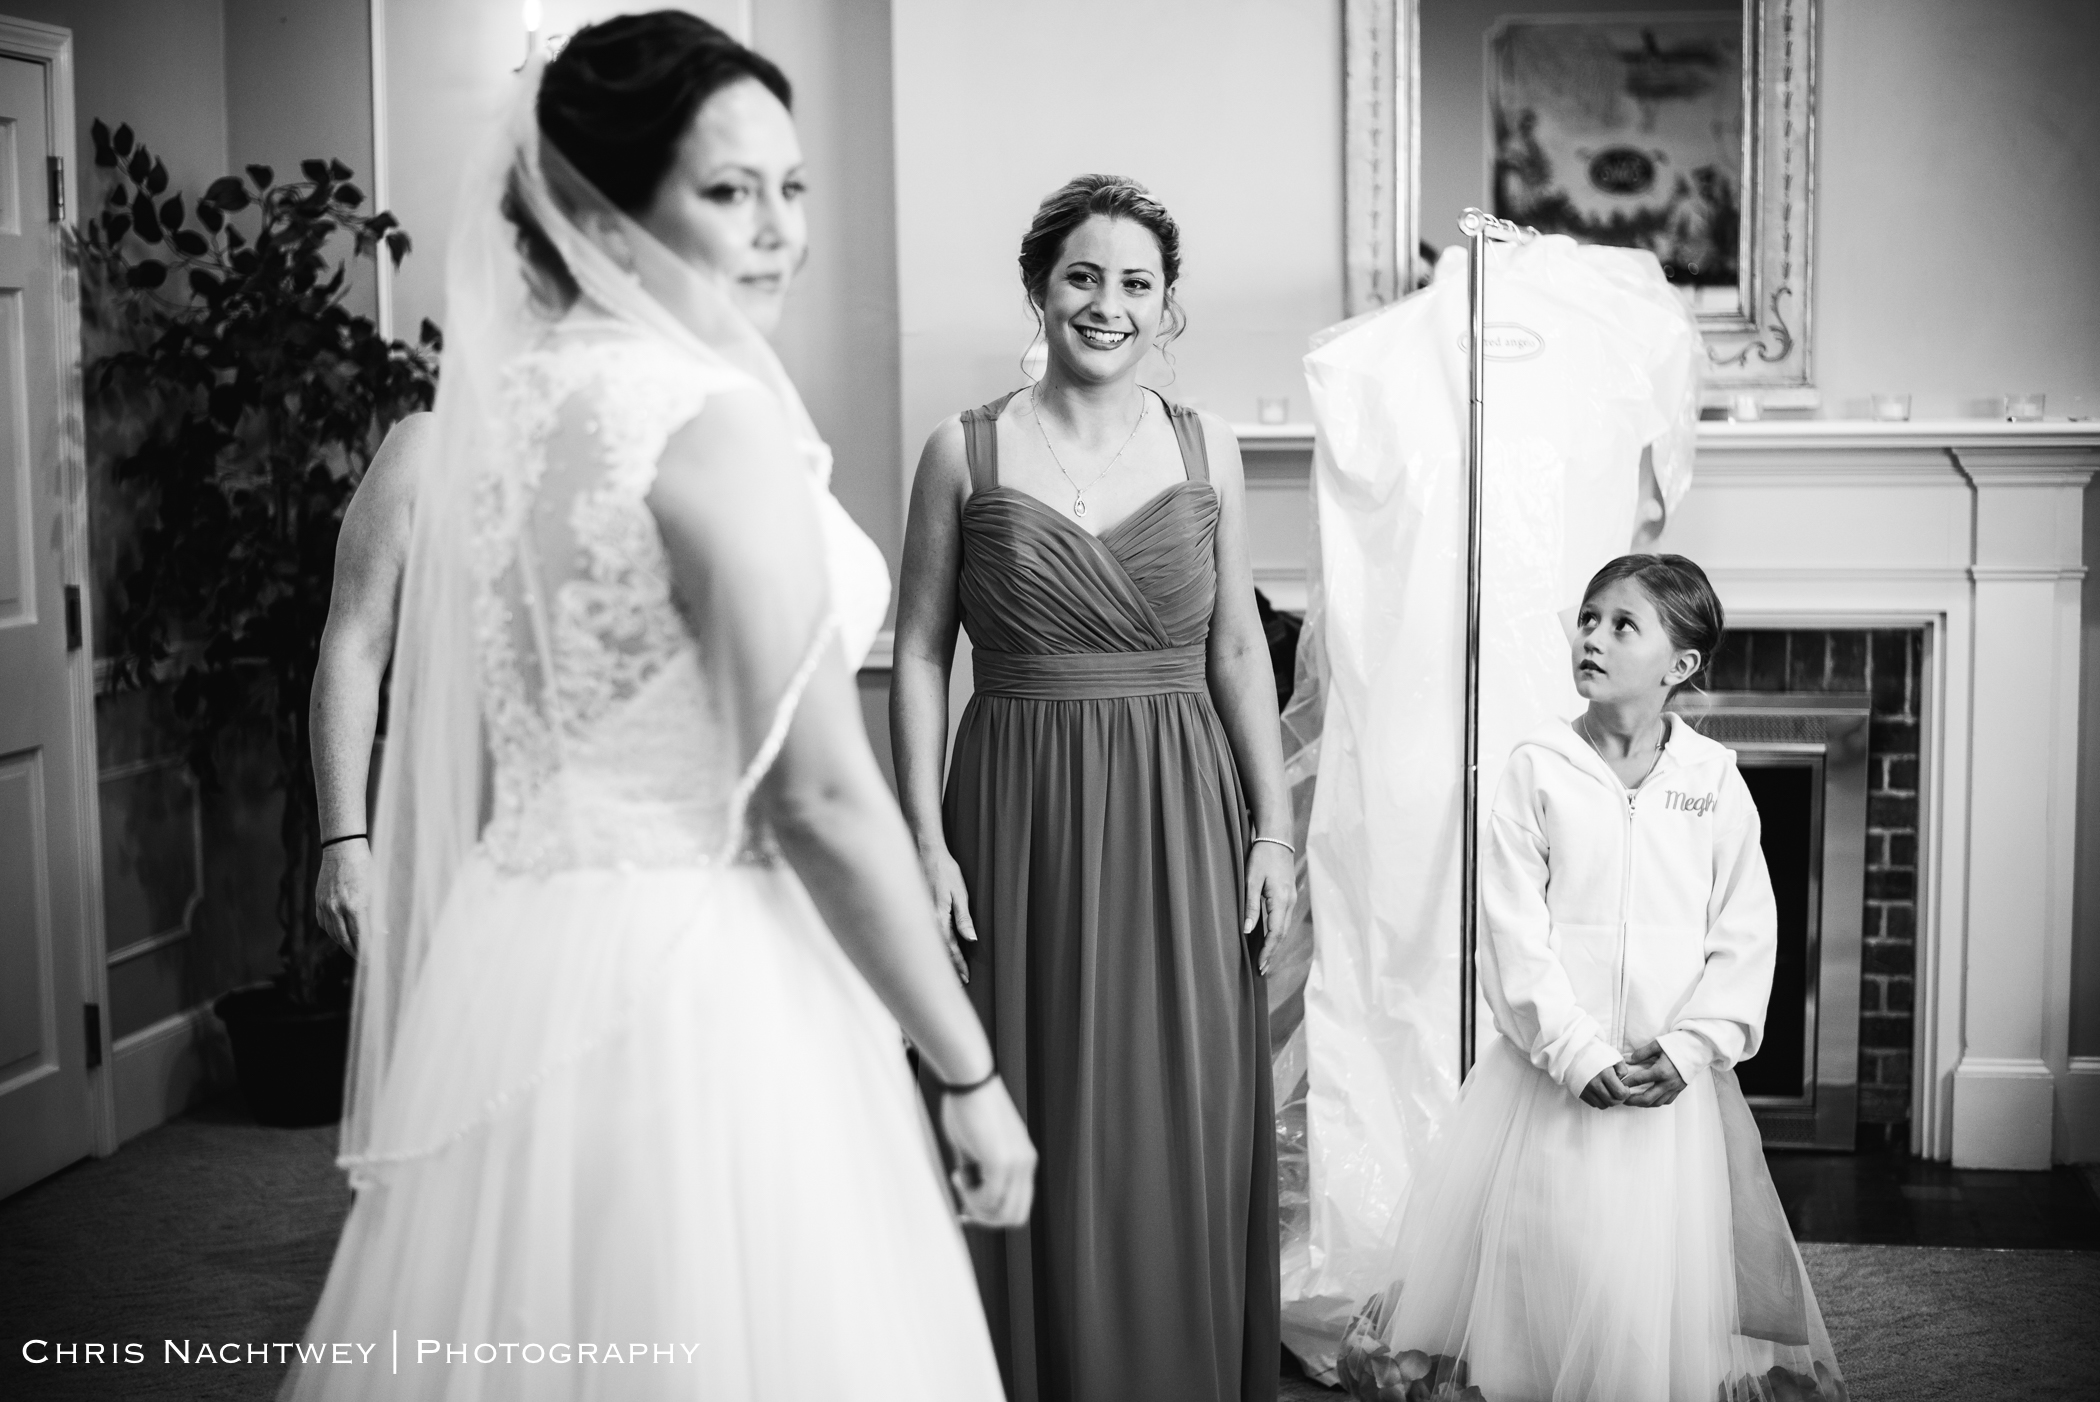 artistic-ct-wedding-photographers-chris-nachtwey-2017-8.jpg